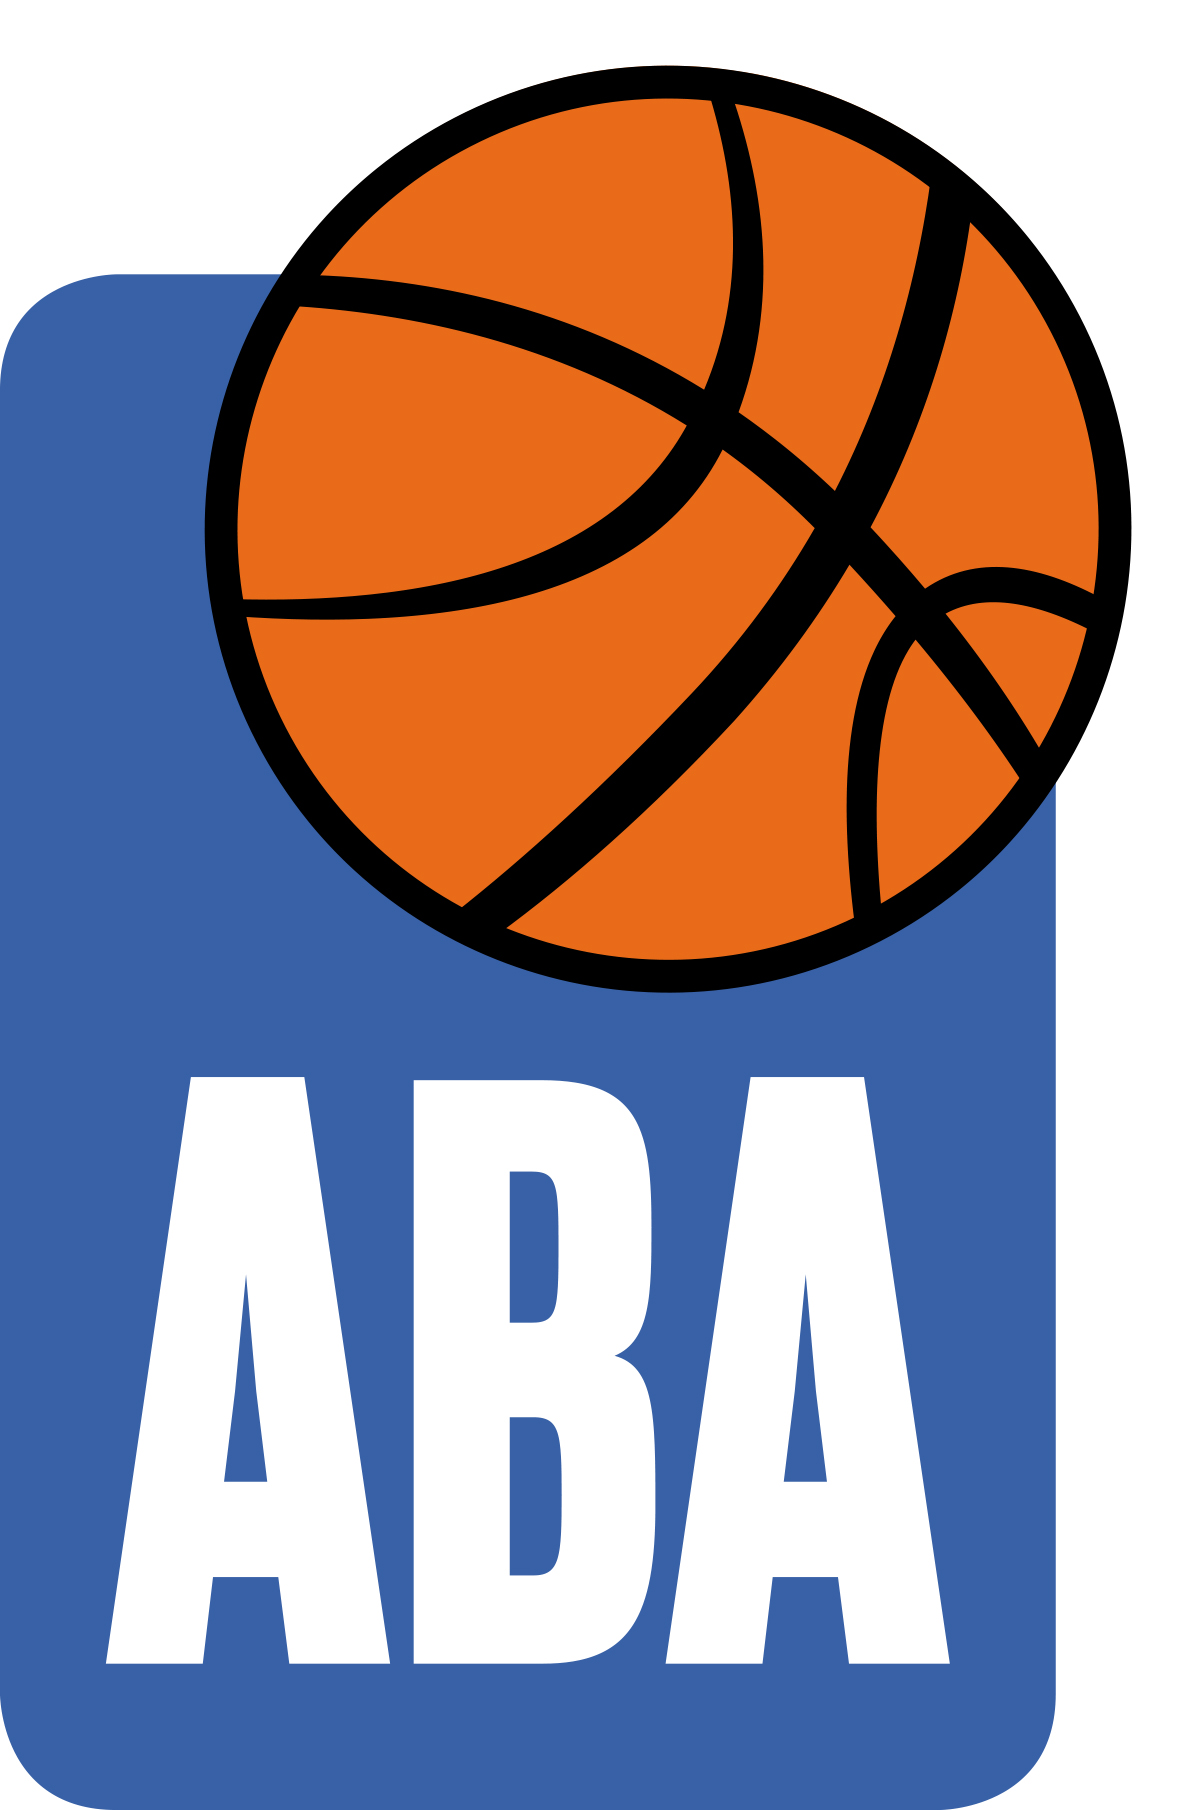 Logos > Marketing : ABA League.